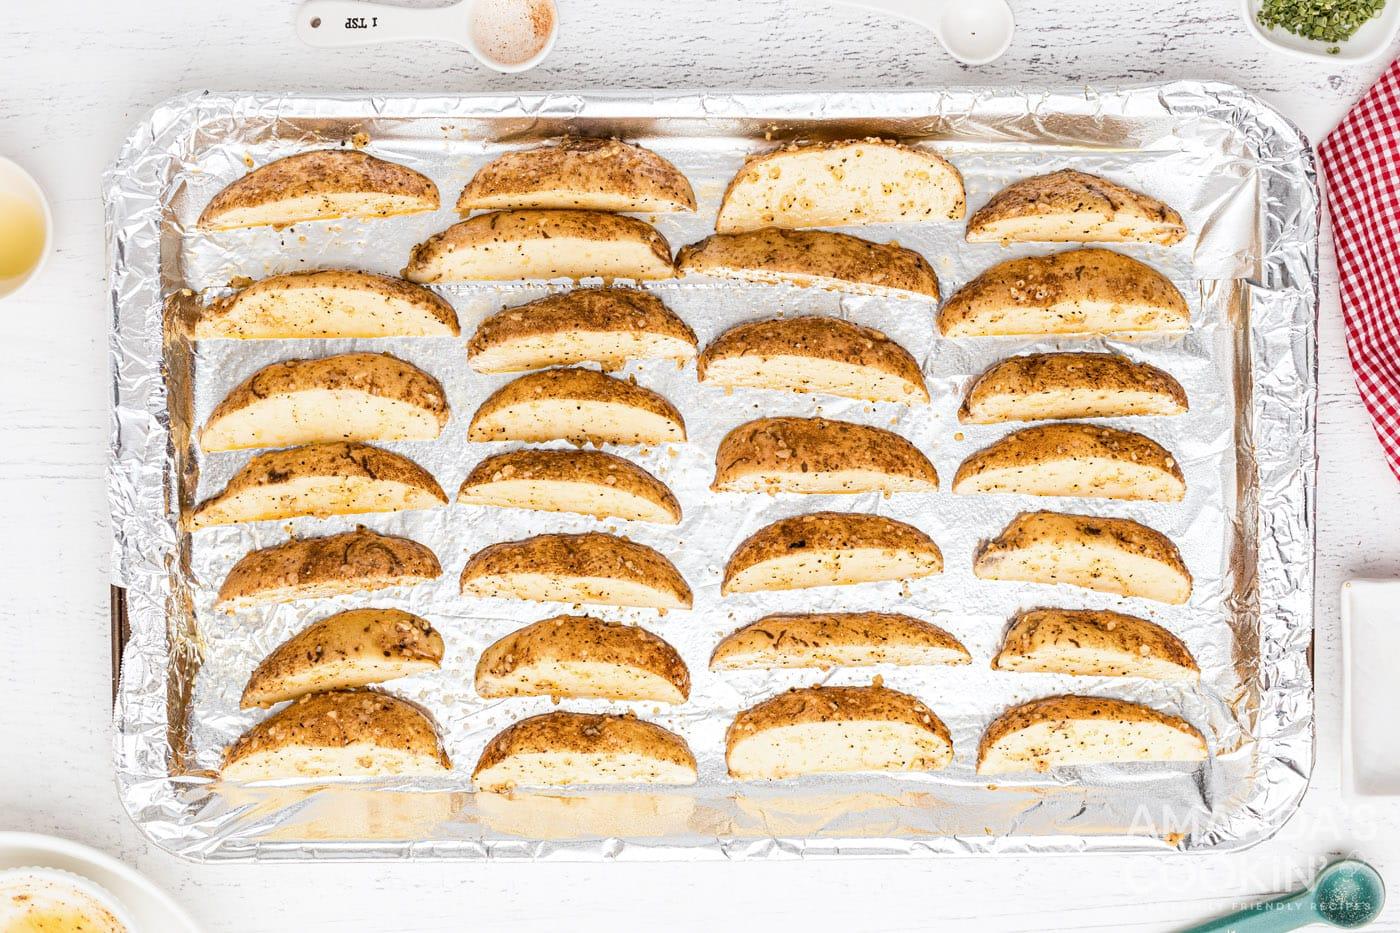 potato wedges on foil lined baking sheet